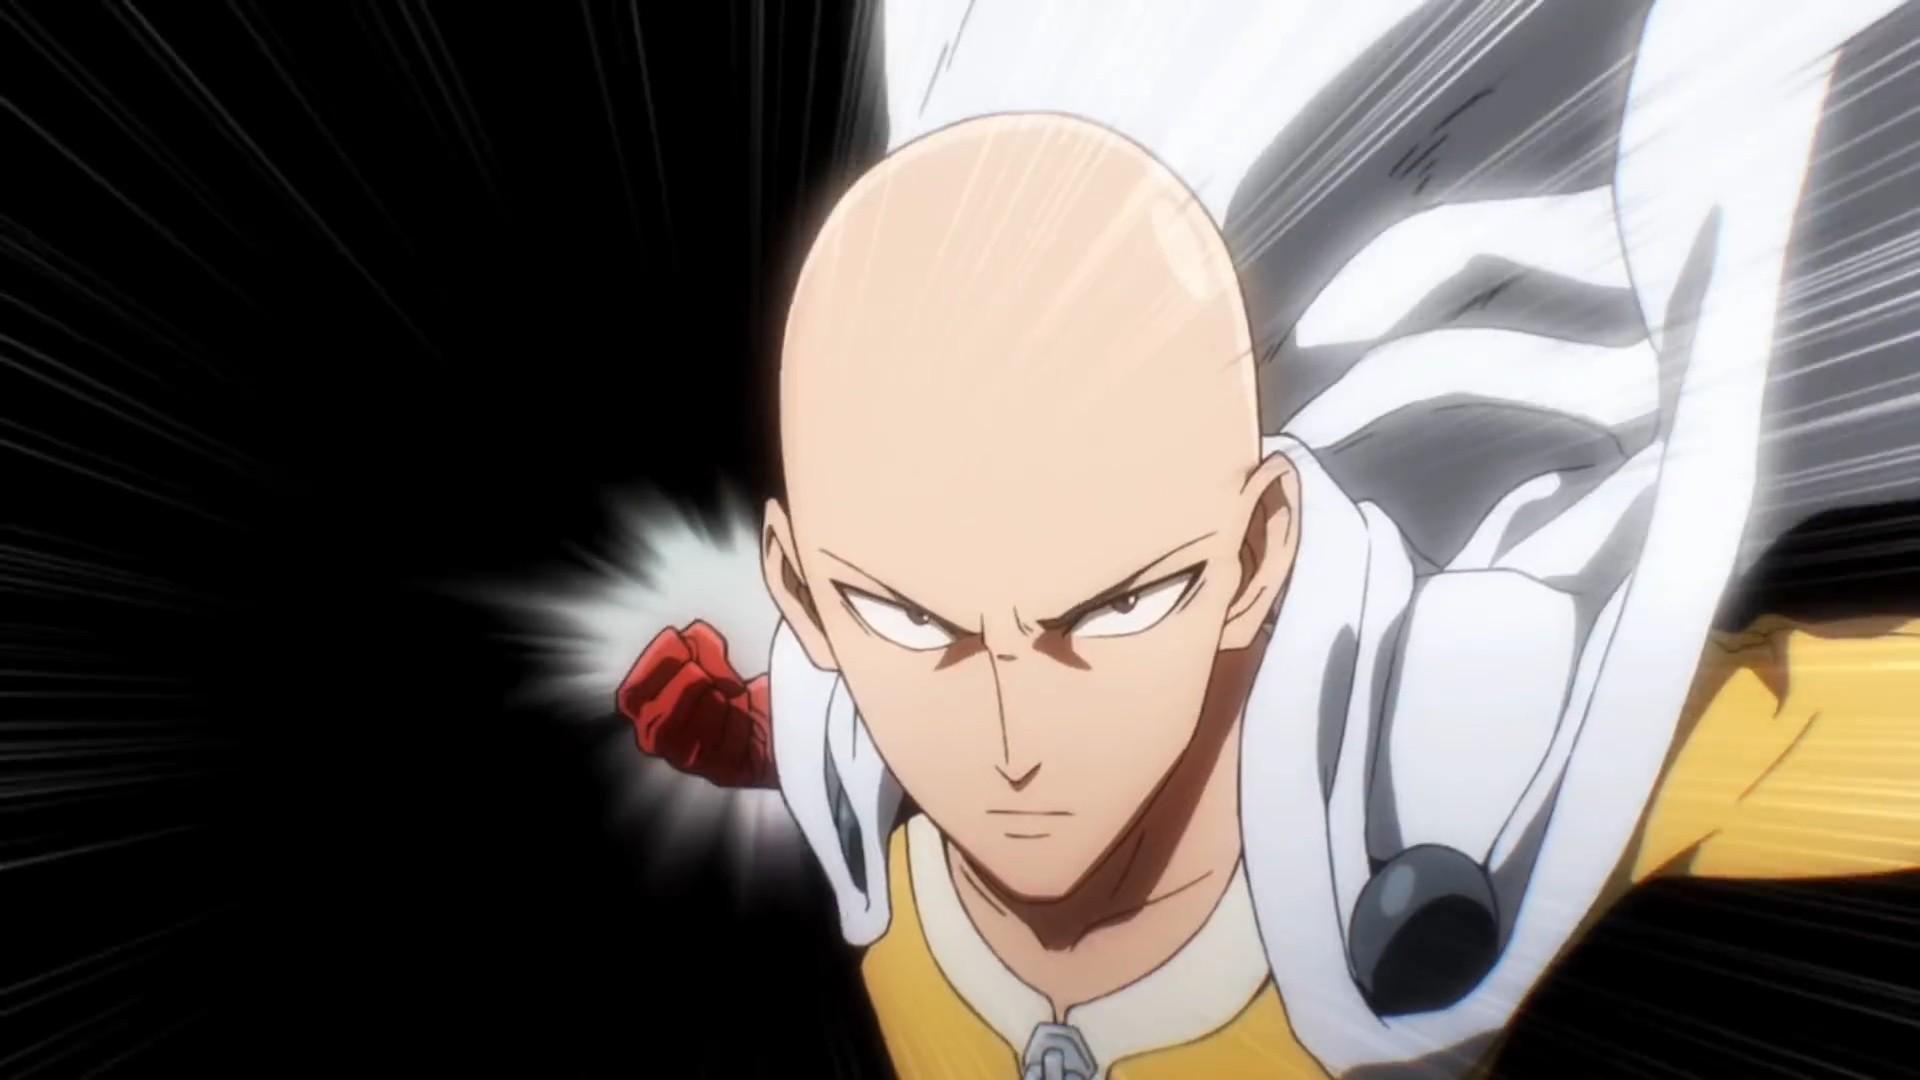 Anime 1920x1080 One-Punch Man Saitama anime boys bald anime